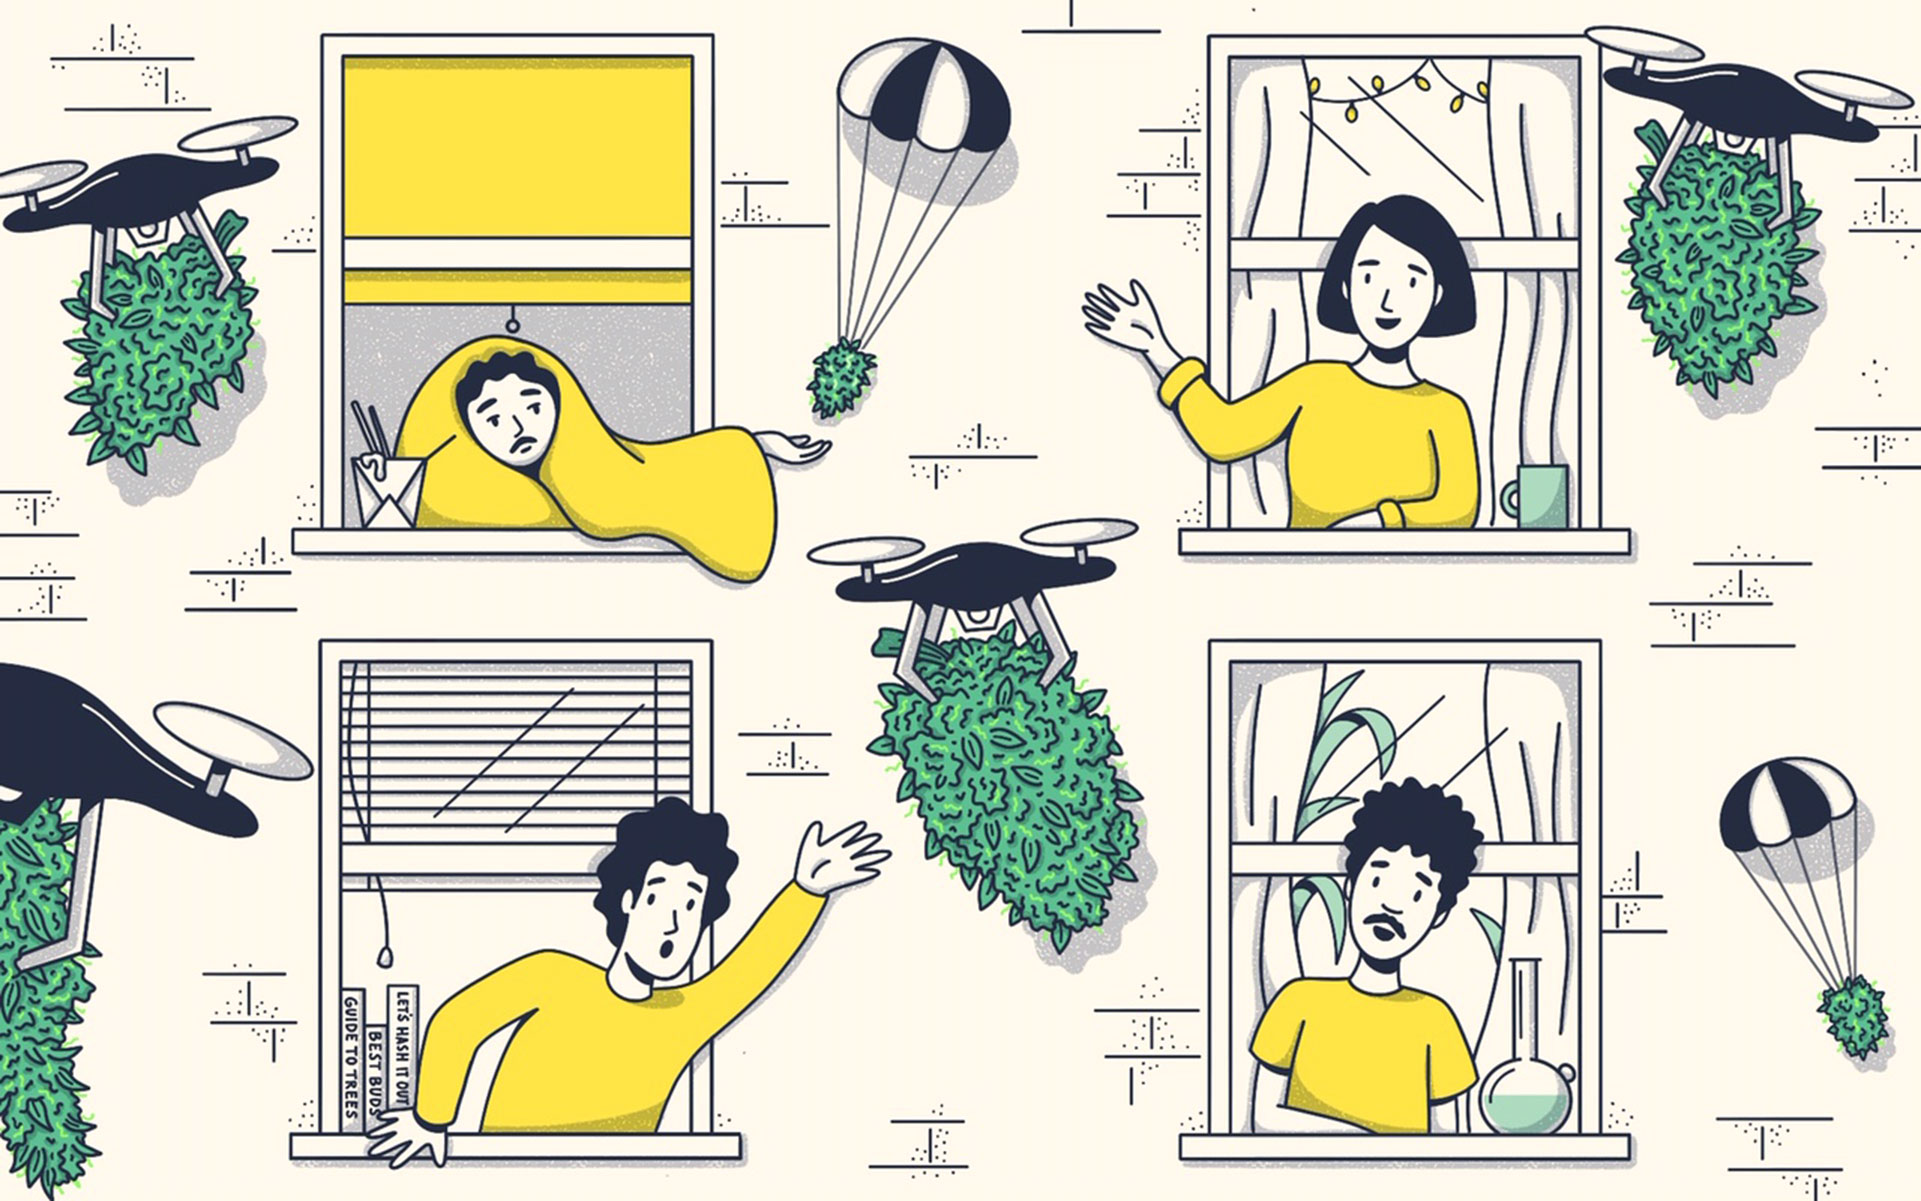 cannabis drone delivery, marijuana delivery